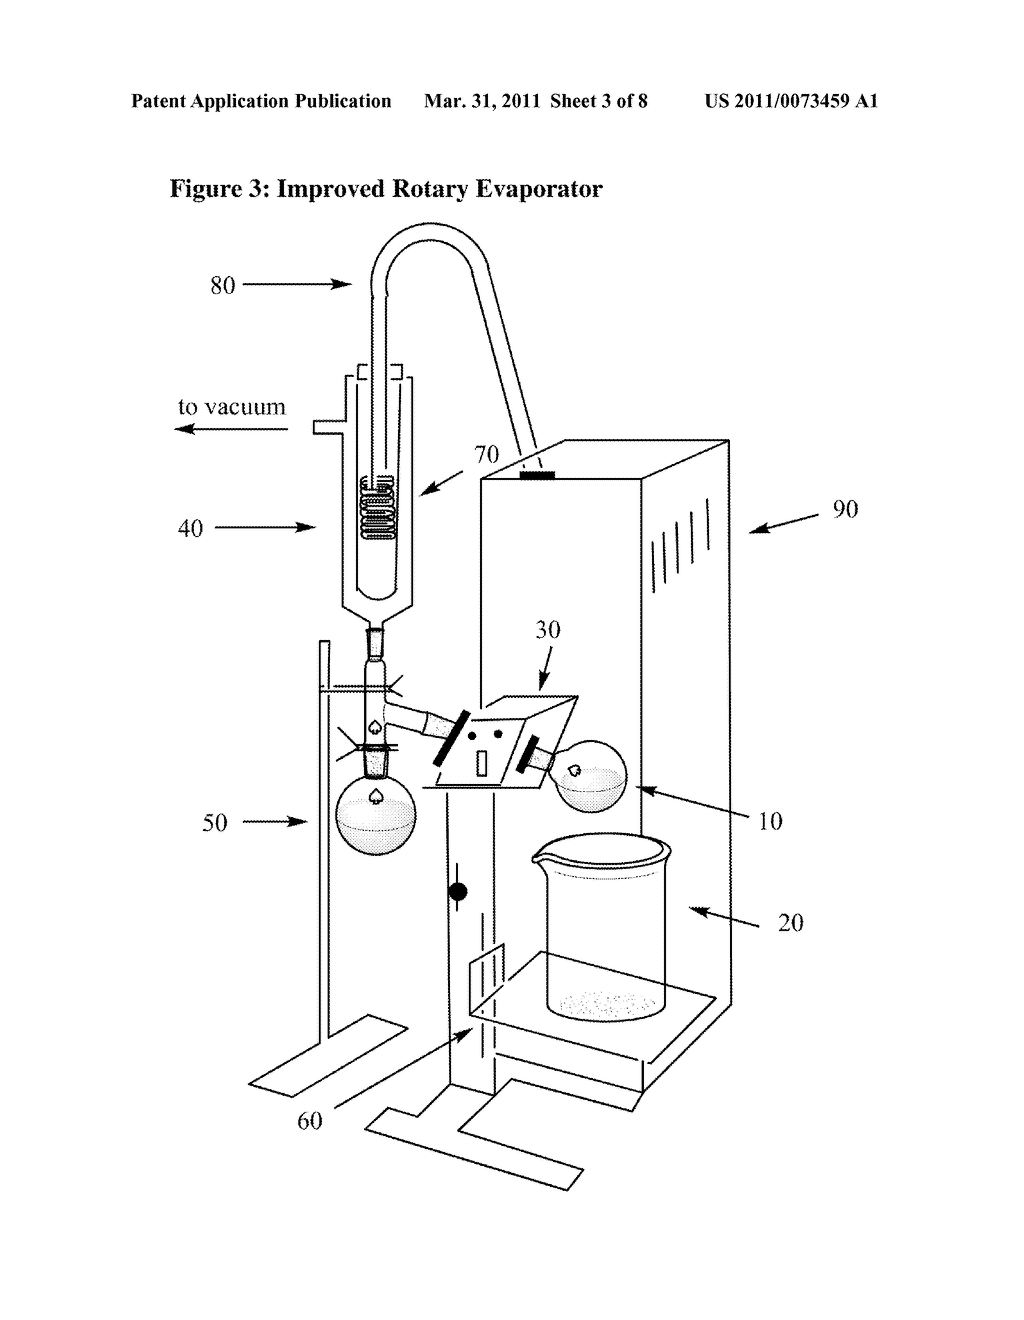 Wiring Diagram For Evaporator